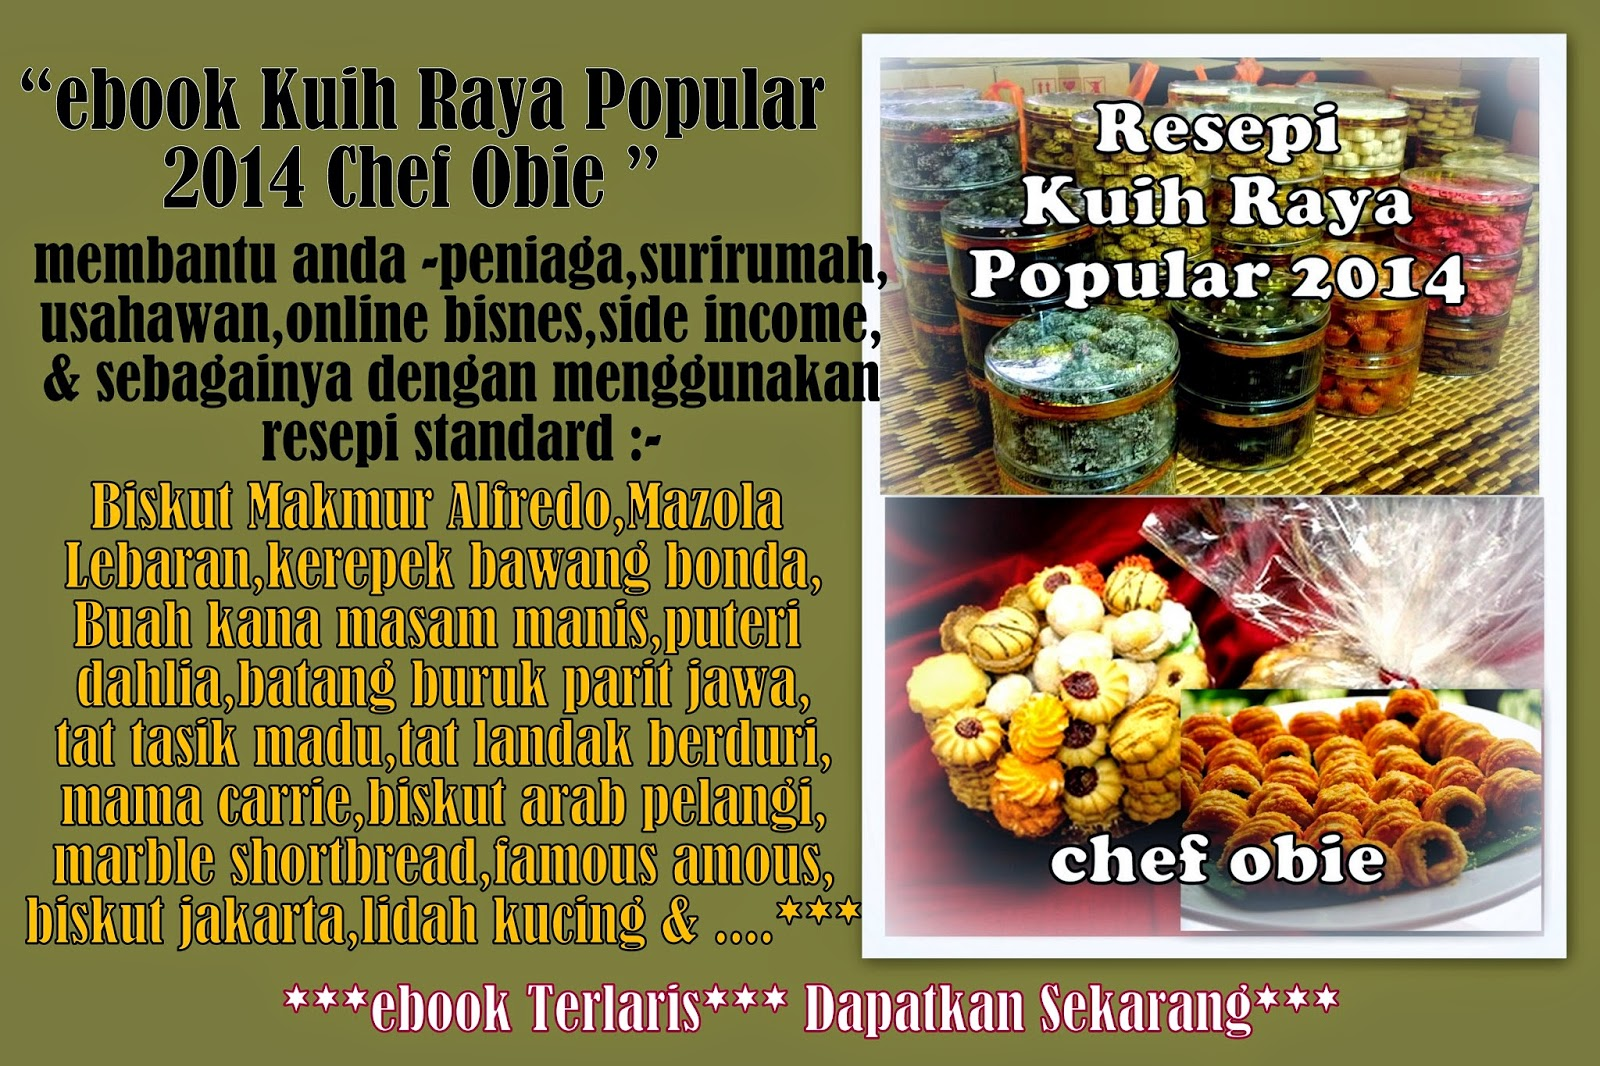 chef obie kelas masakan  info resepi kelas biskut raya chef obie  modul barat Resepi Biskut Mazola Chef Hanieliza Enak dan Mudah